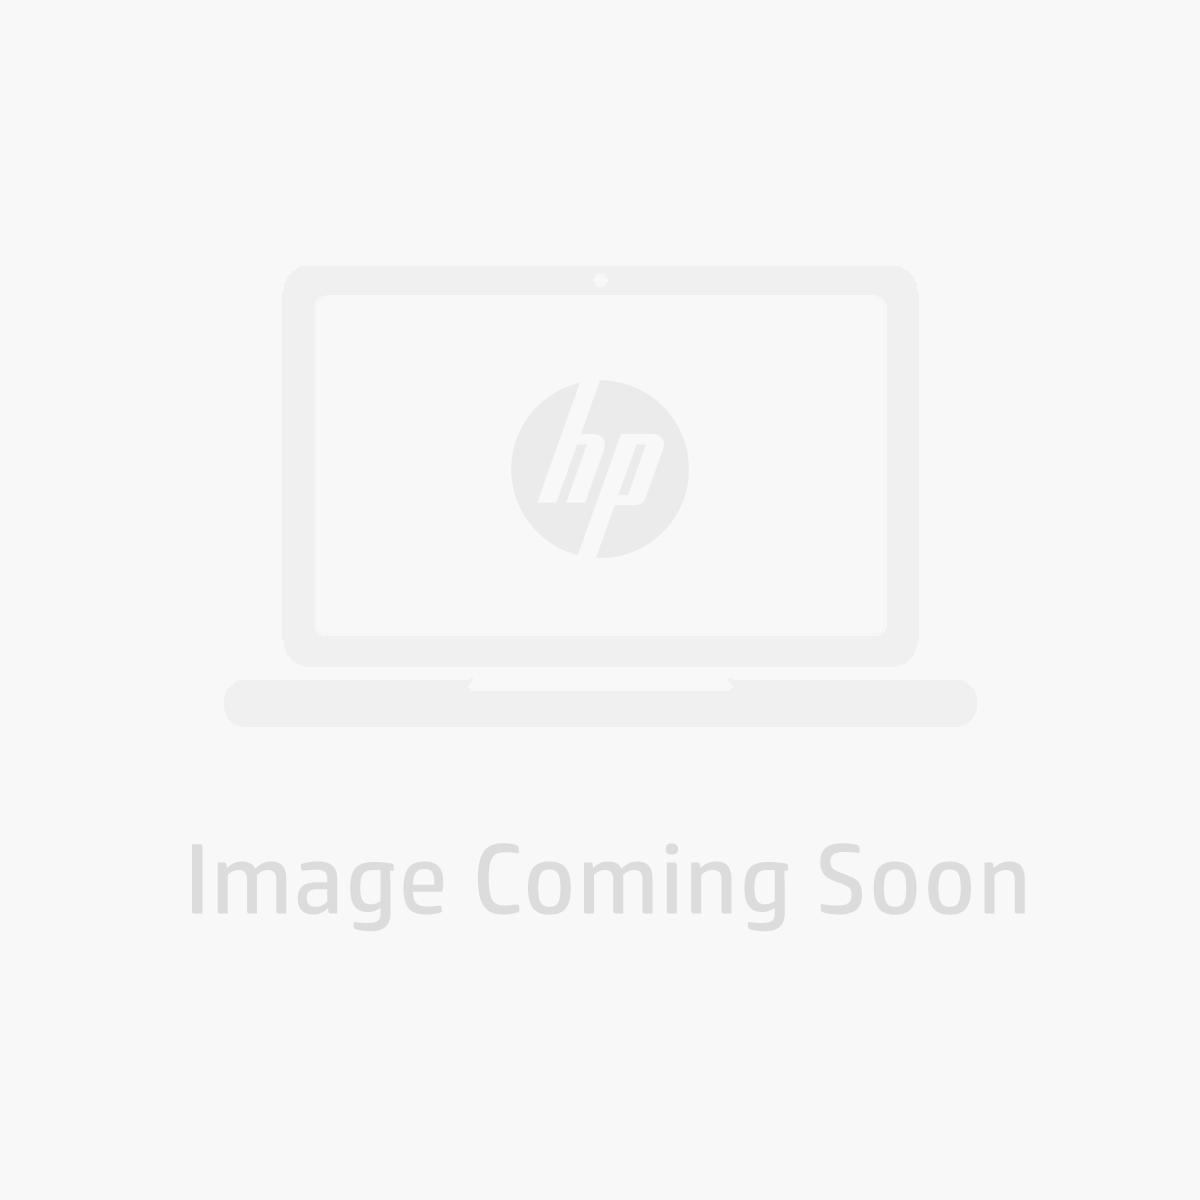 HP 934XL High Yield Black Original Ink Cartridge